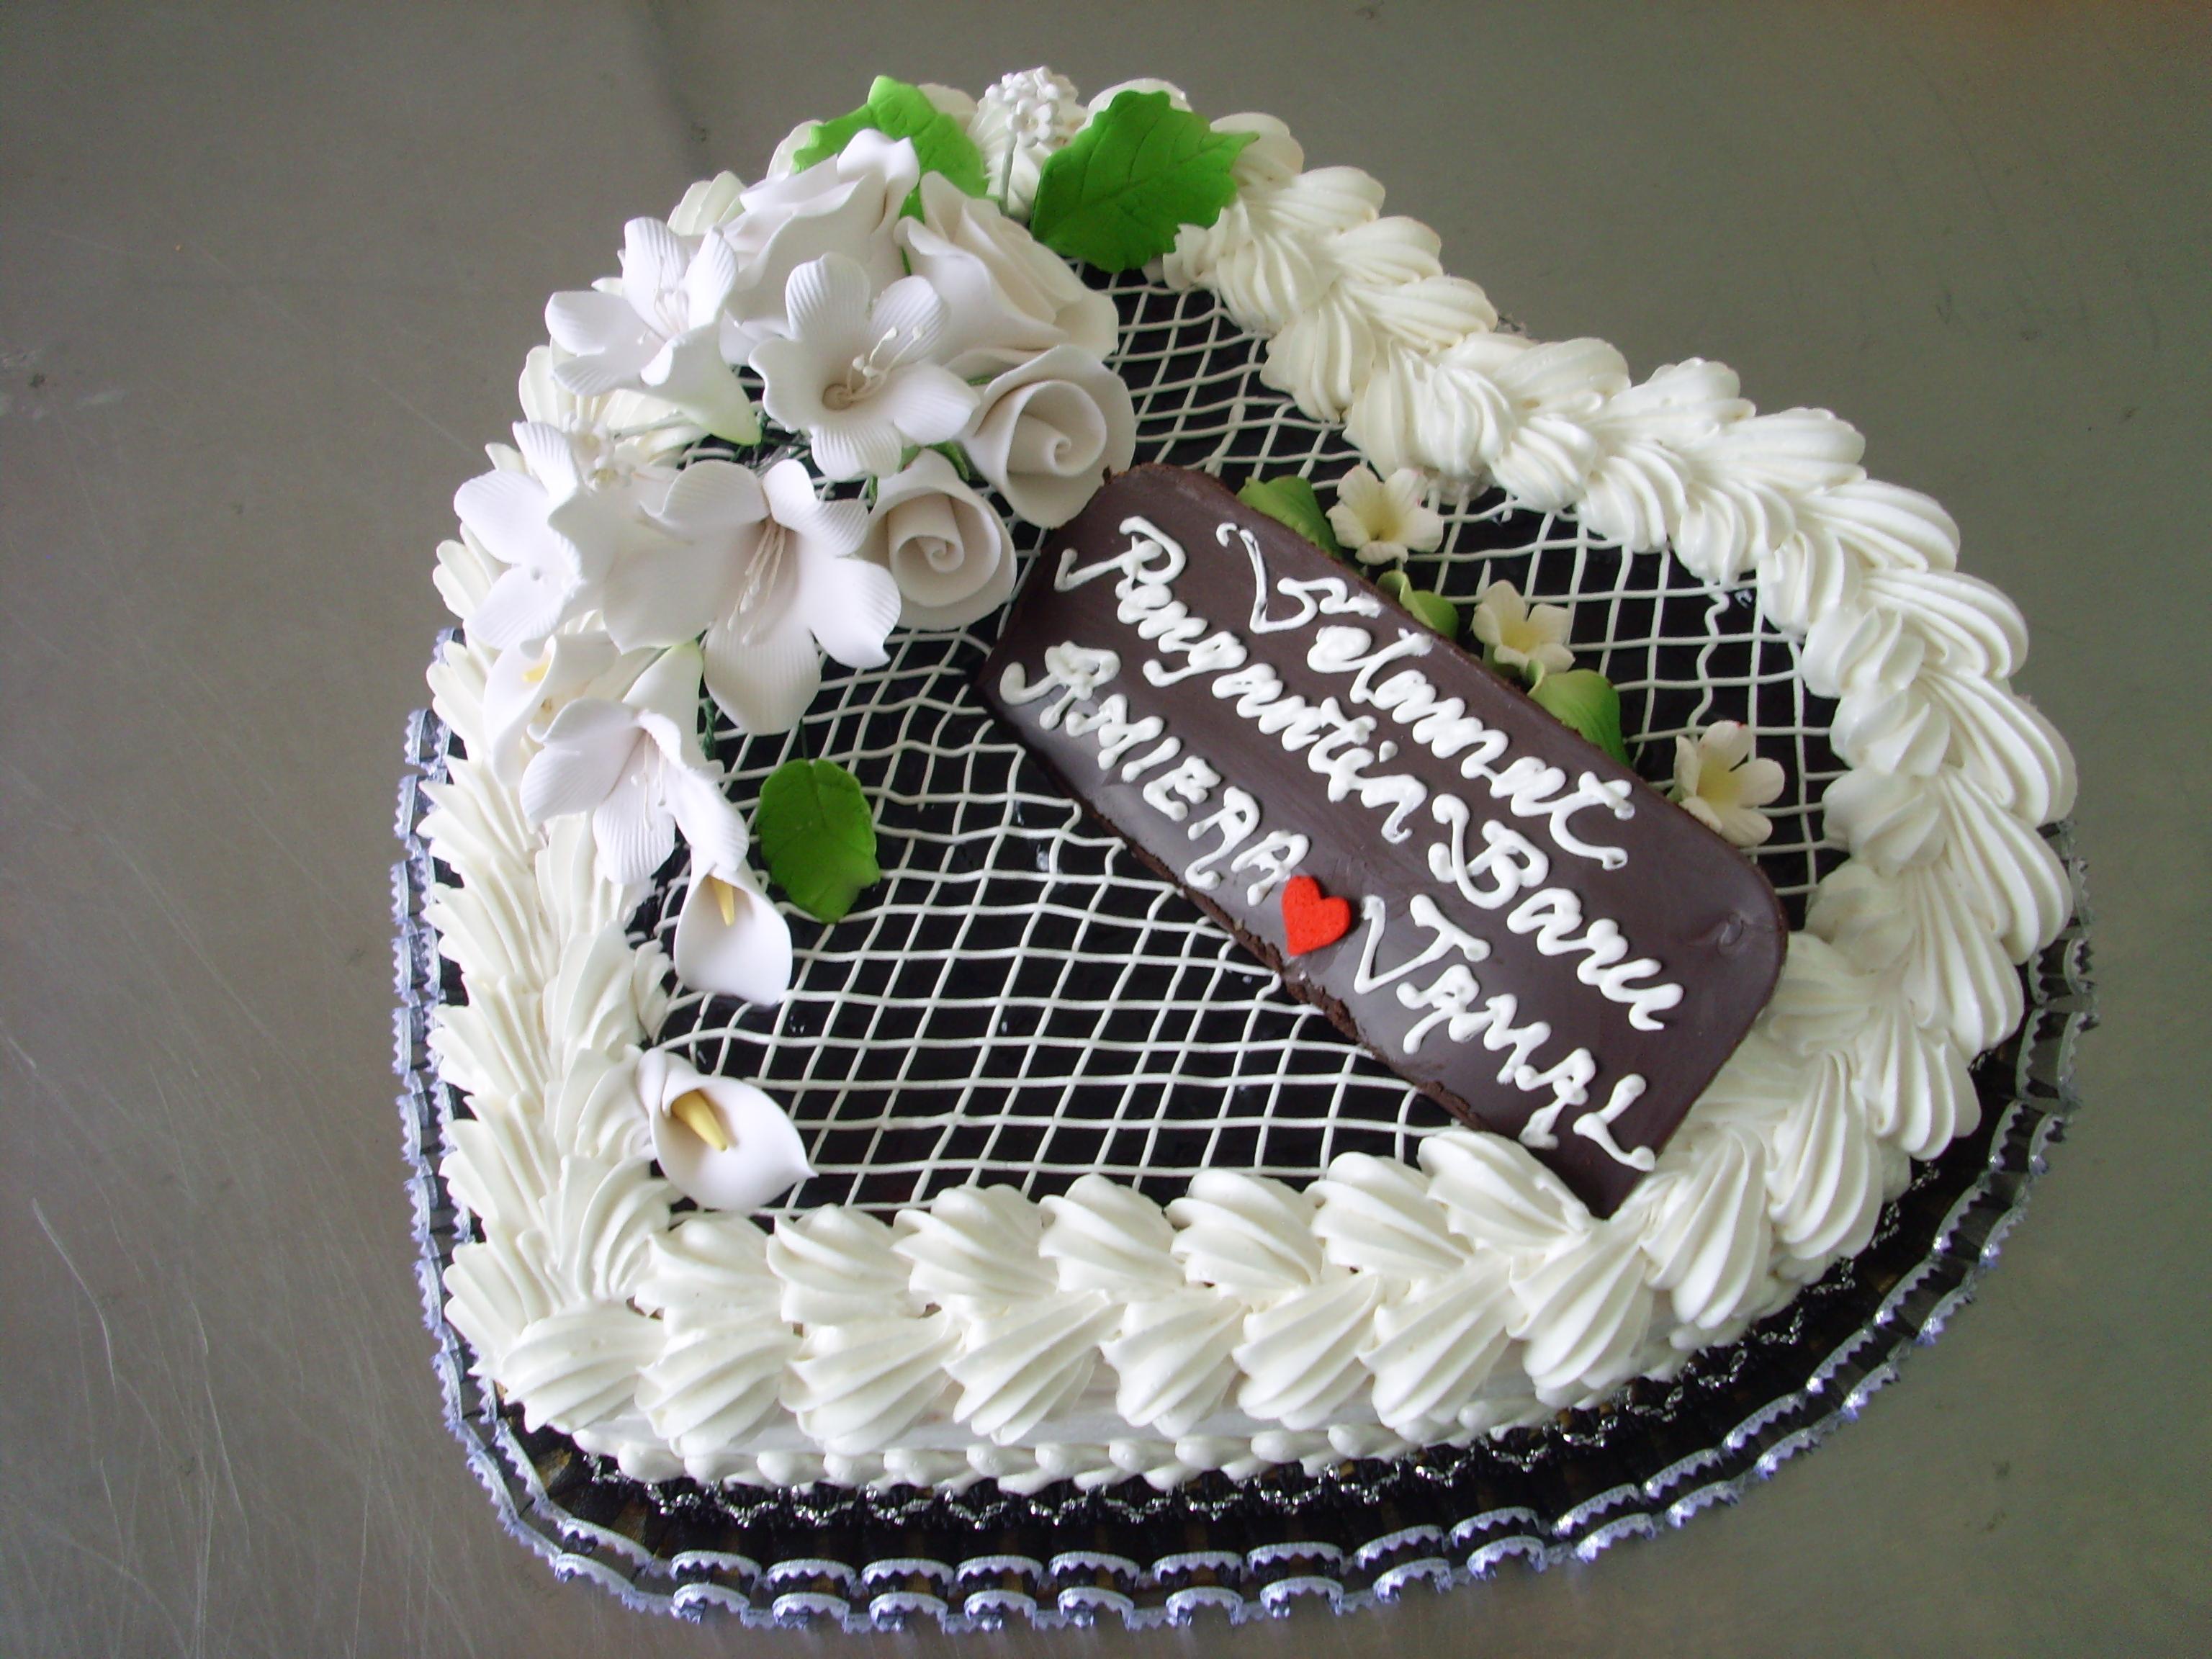 Birthday Cake With Name Tag ~ Wedding cakes bakerinacakes s page